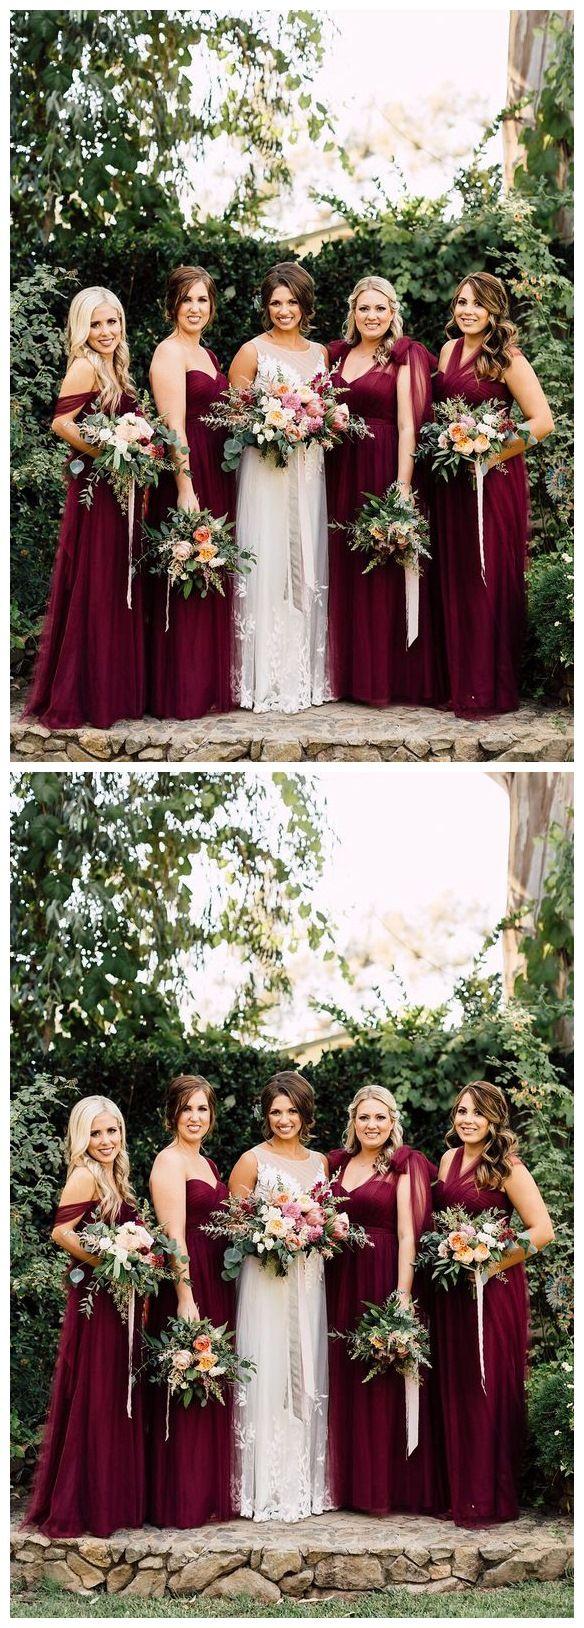 Burgundy Convertible Bridesmaid Dresses Tulle Purple Mismatched Bridesmaid Dresses Ard1166 Maroon Bridesmaid Dresses Burgundy Bridesmaid Dresses Marron Bridesmaid Dresses [ 1628 x 584 Pixel ]